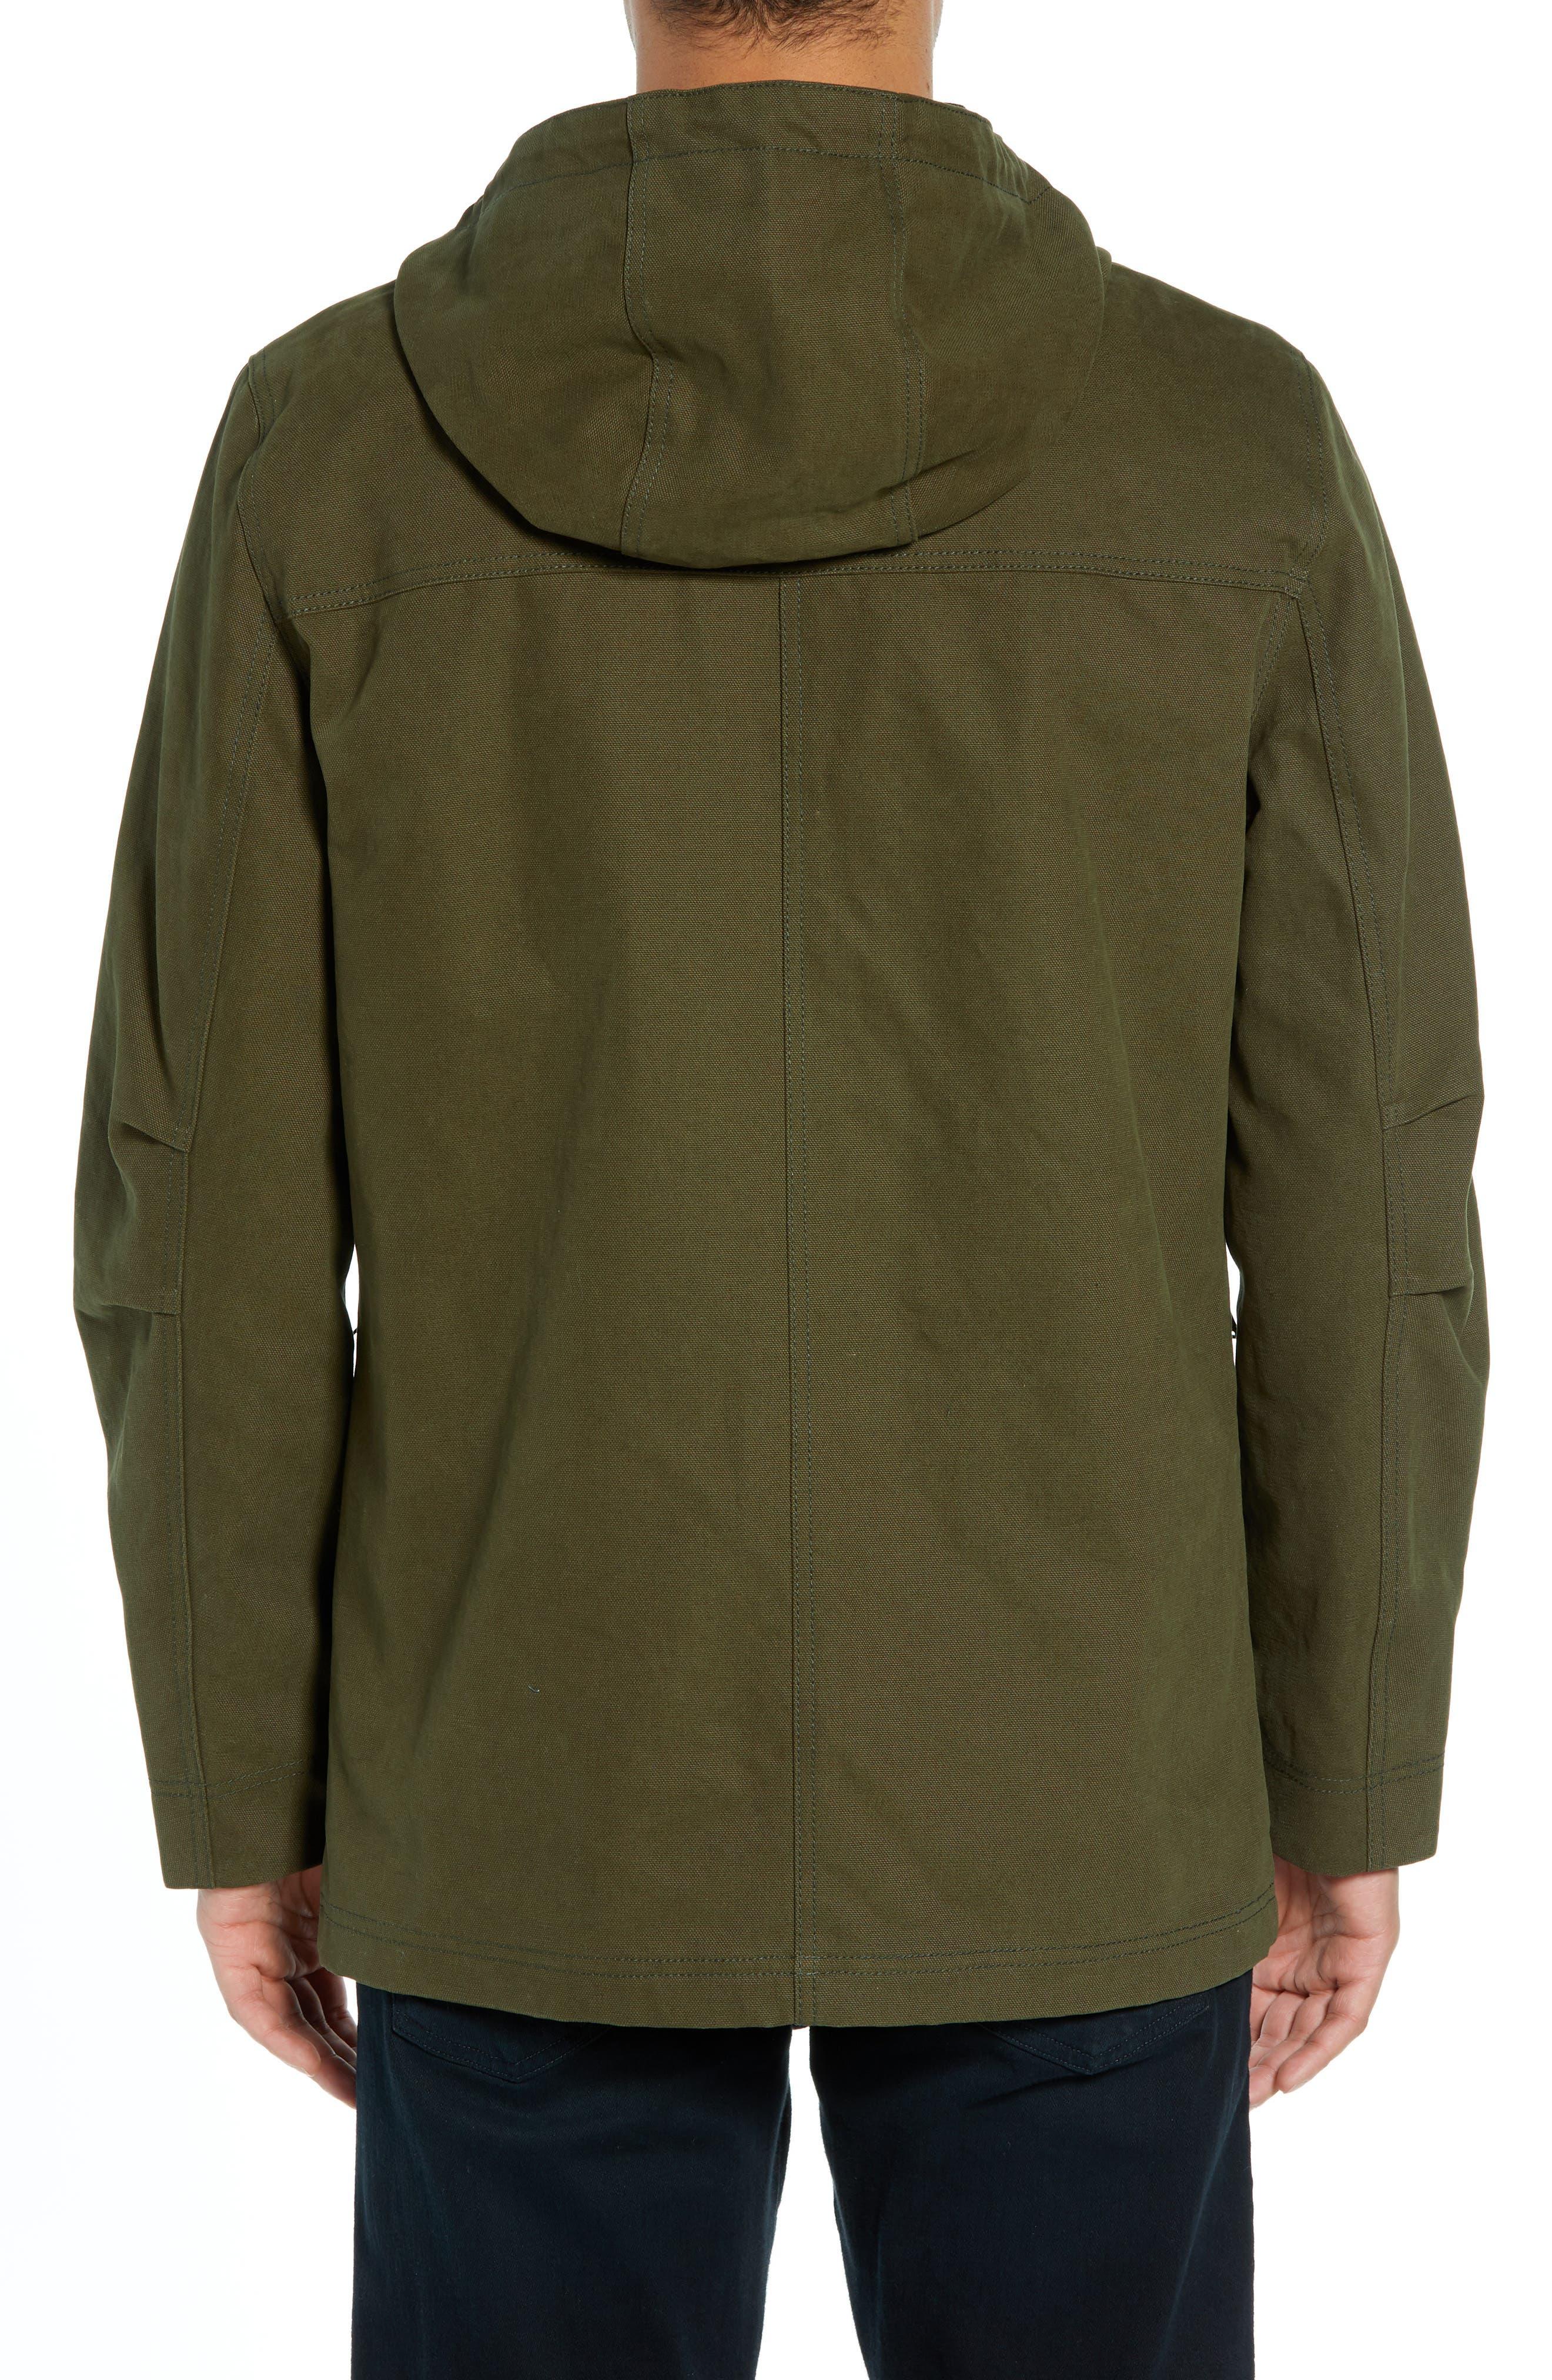 Dry Goods Cascade Raincoat,                             Alternate thumbnail 2, color,                             OLIVE